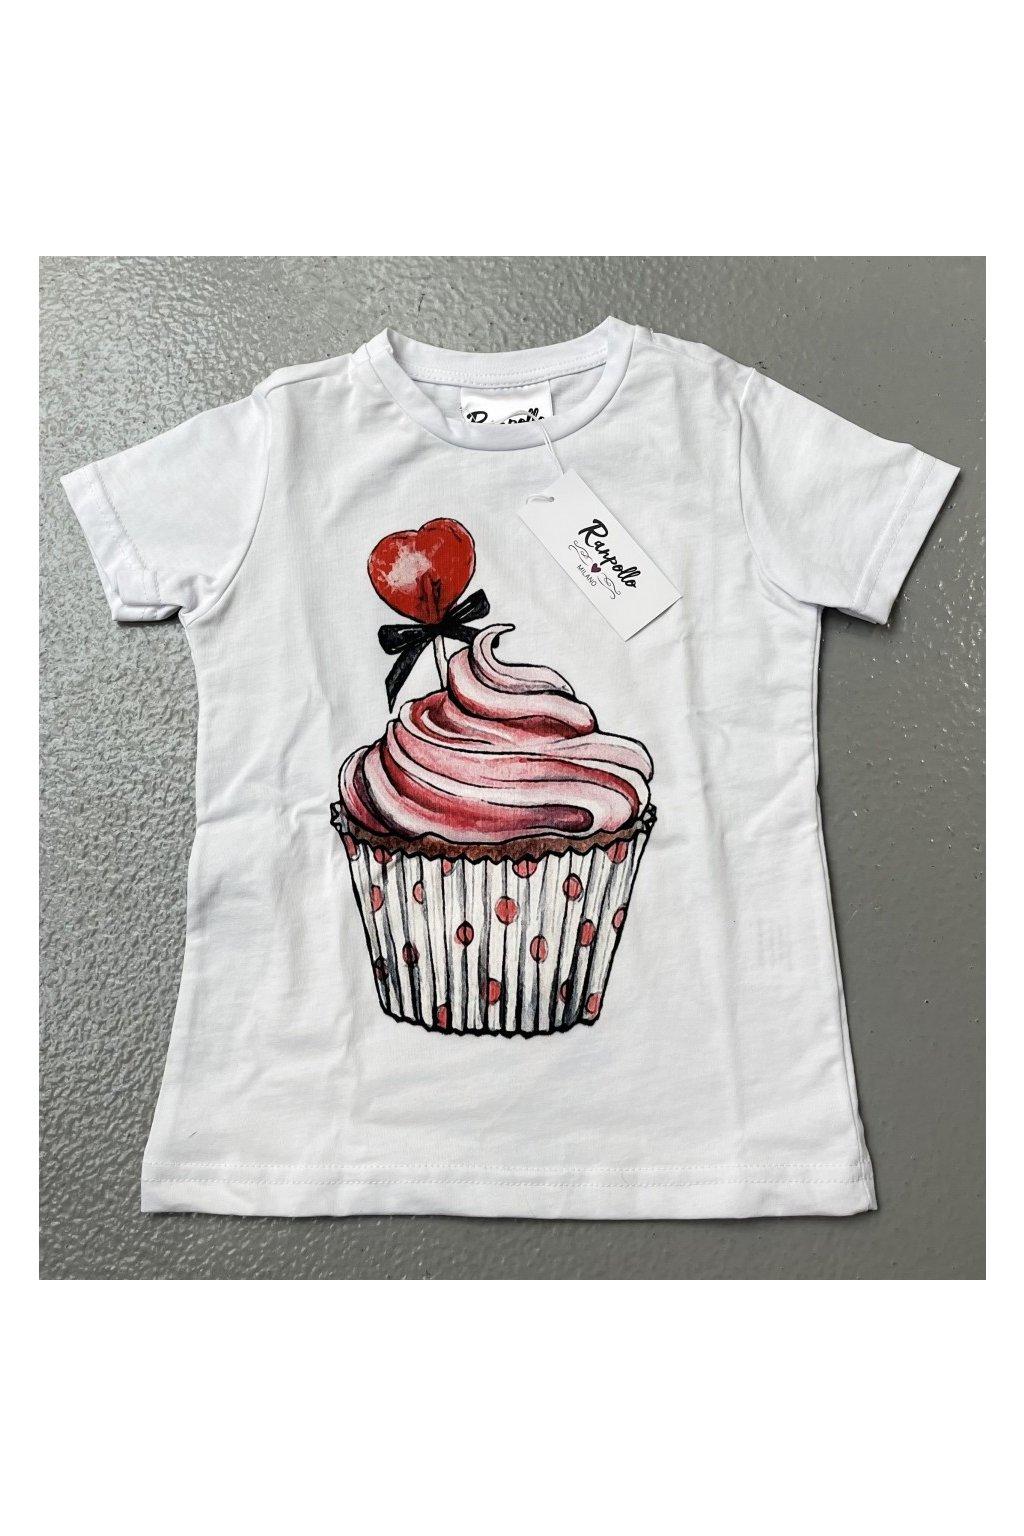 Tričko baby cupcake, RANPOLLO - bílé (Velikost Velikost 10)